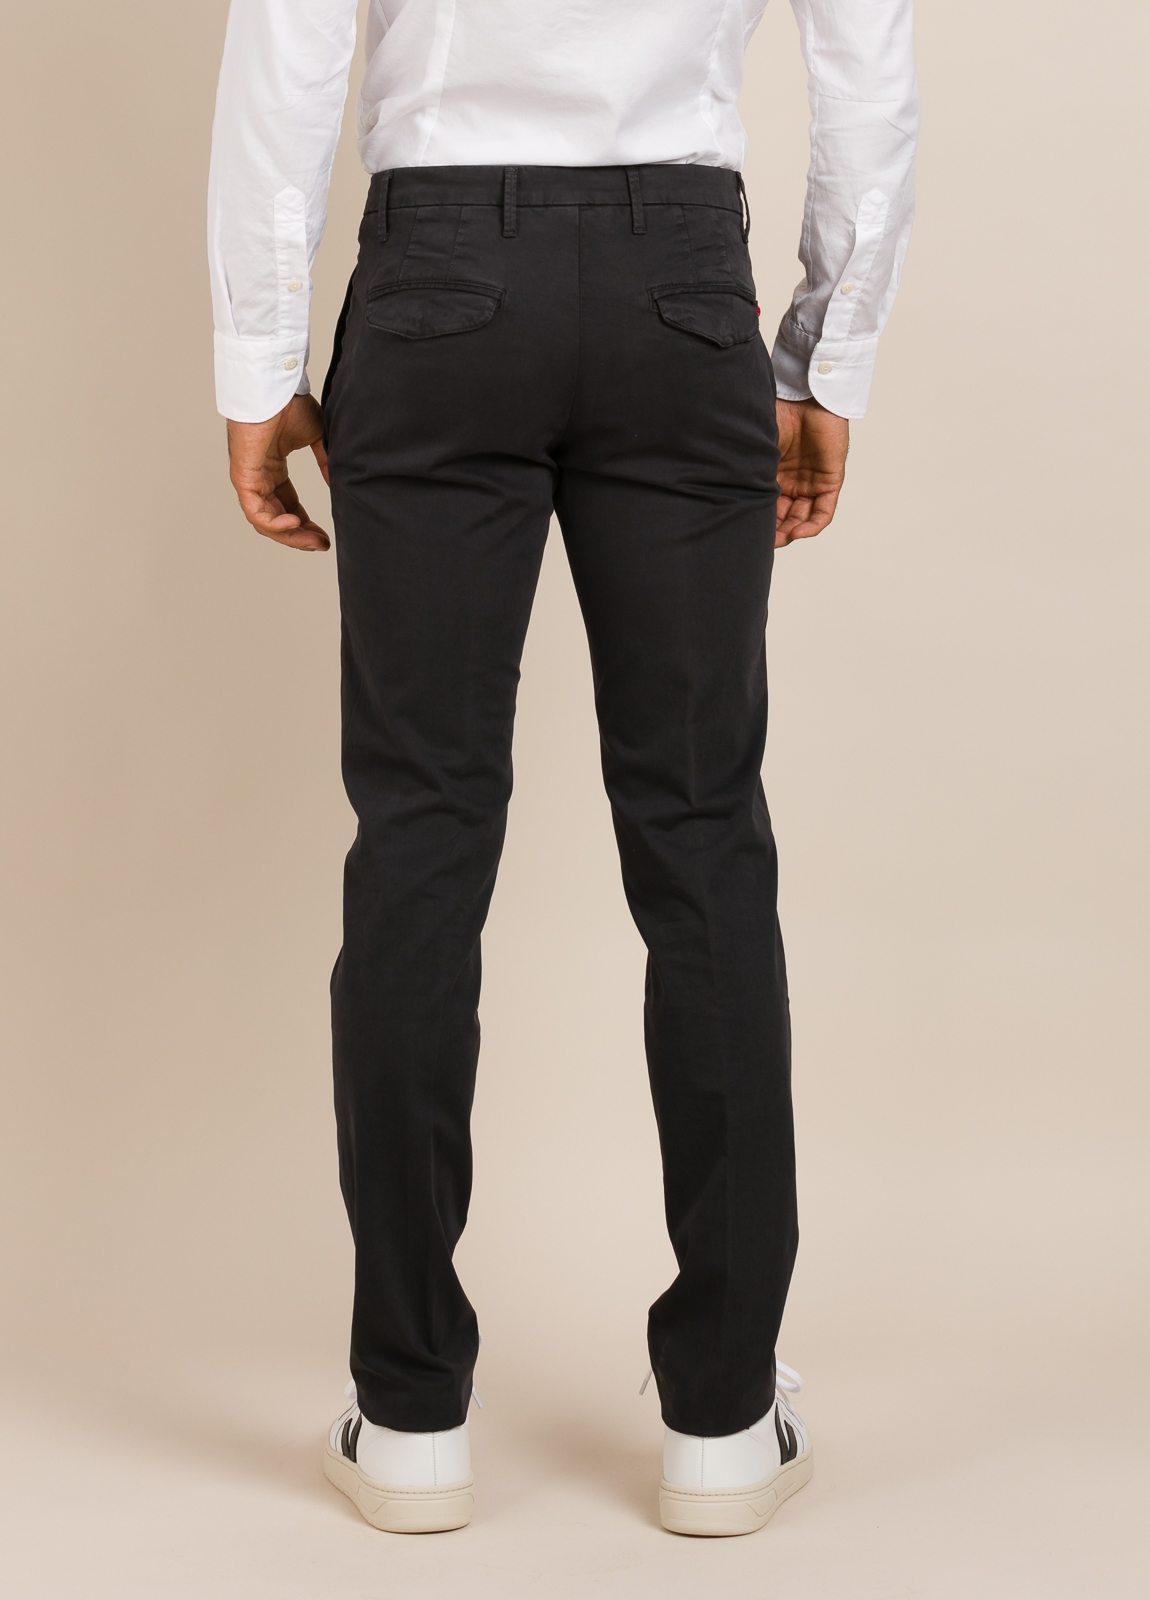 Pantalón MANUEL RITZ gris oscuro - Ítem1